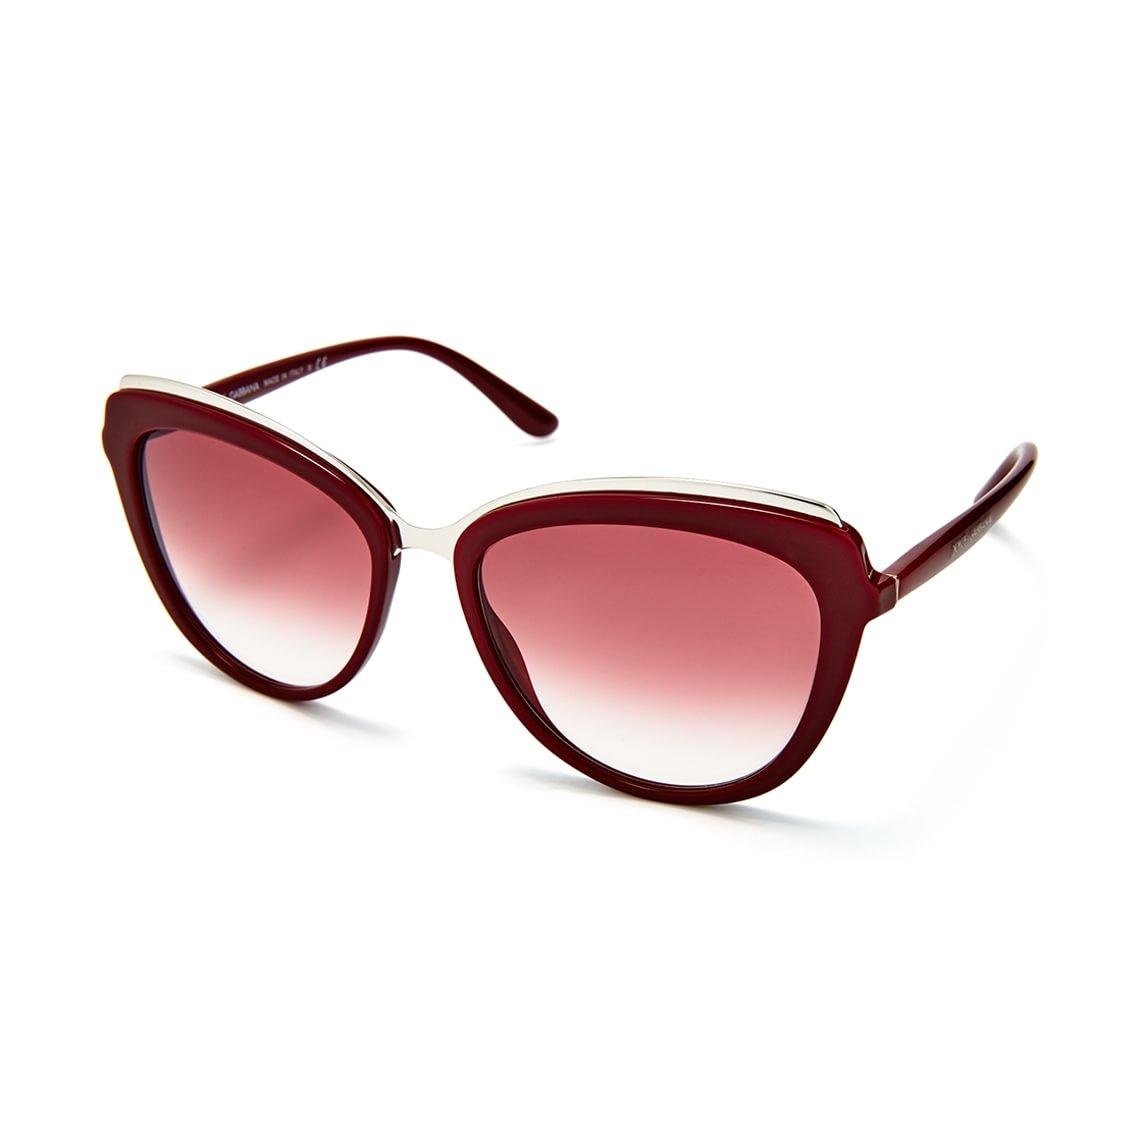 Dolce & Gabbana DG4304 30918H 5717